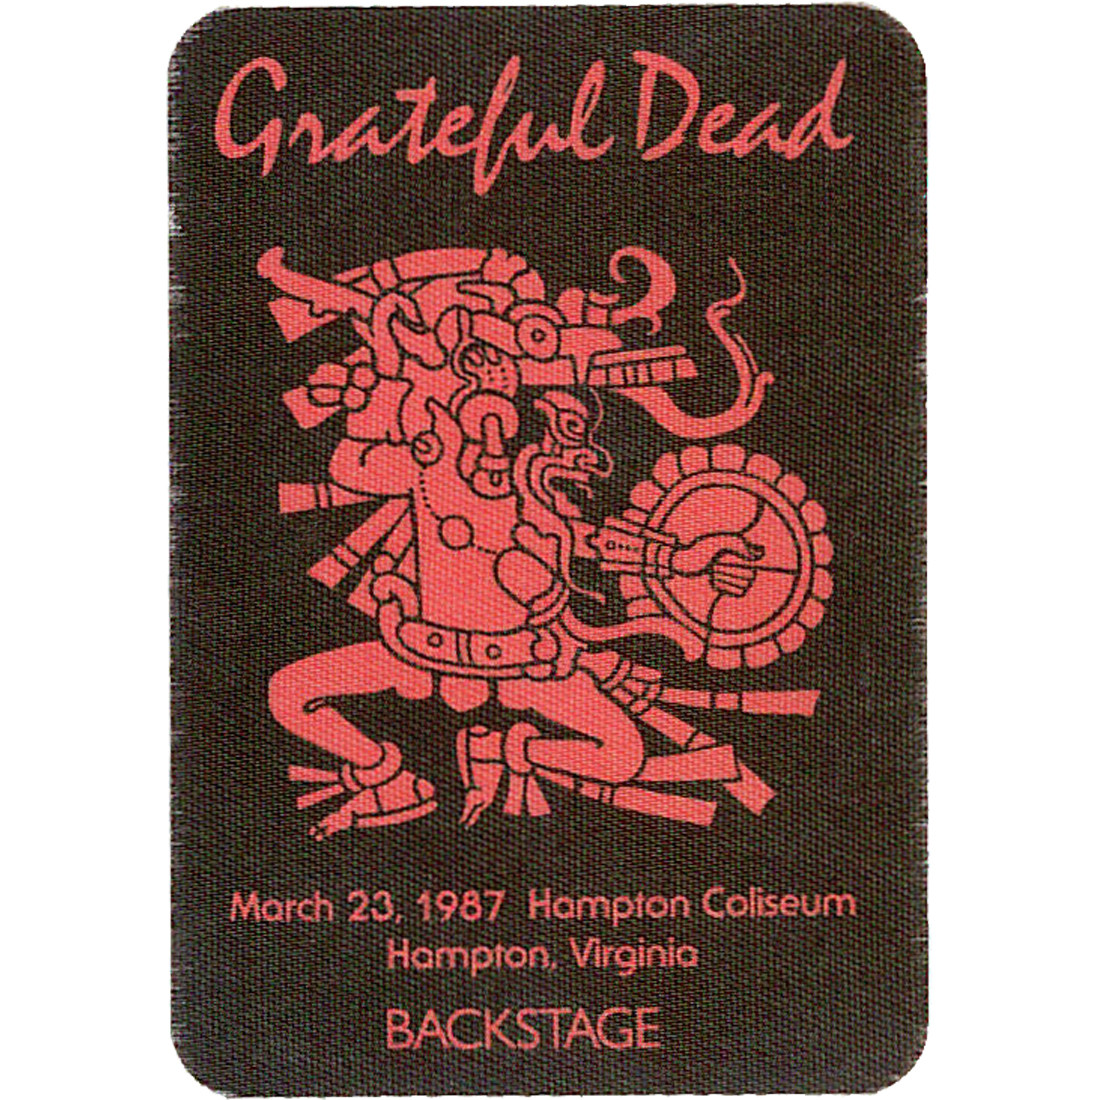 Grateful Dead 1987 03-23 Backstage Pass